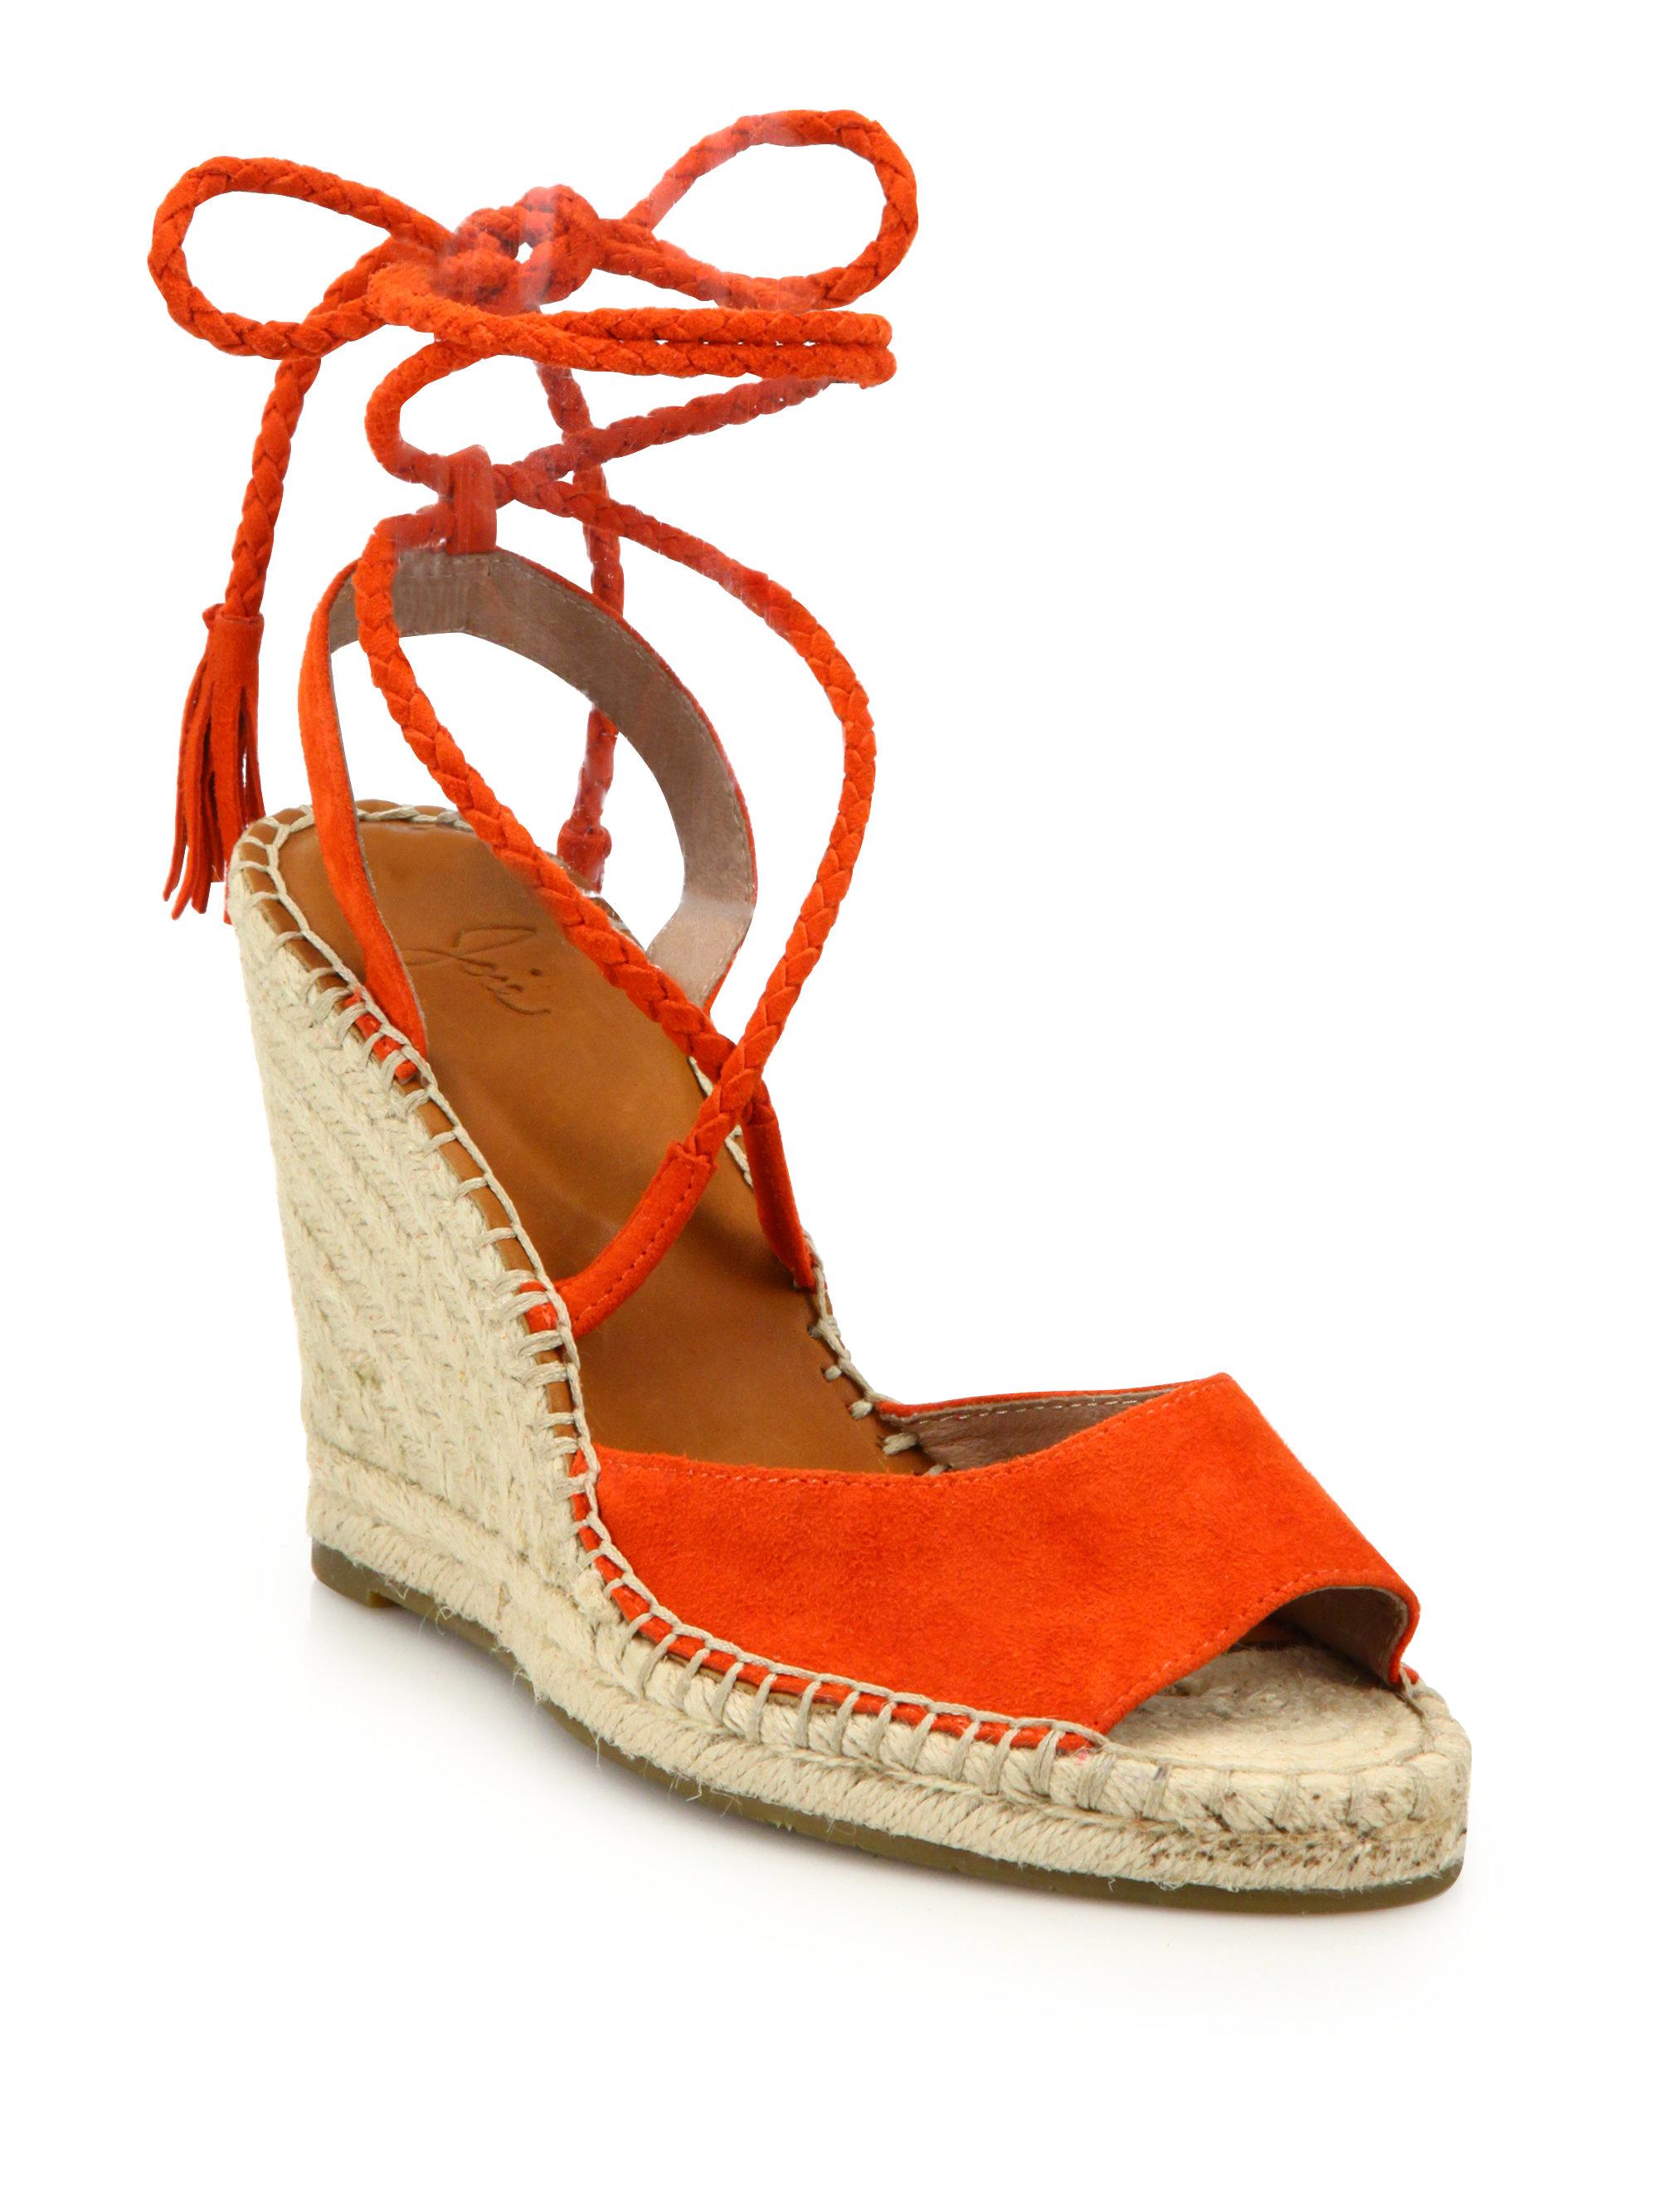 eab132c83a1 Joie Orange Phyllis Suede Lace-up Espadrille Wedge Sandals